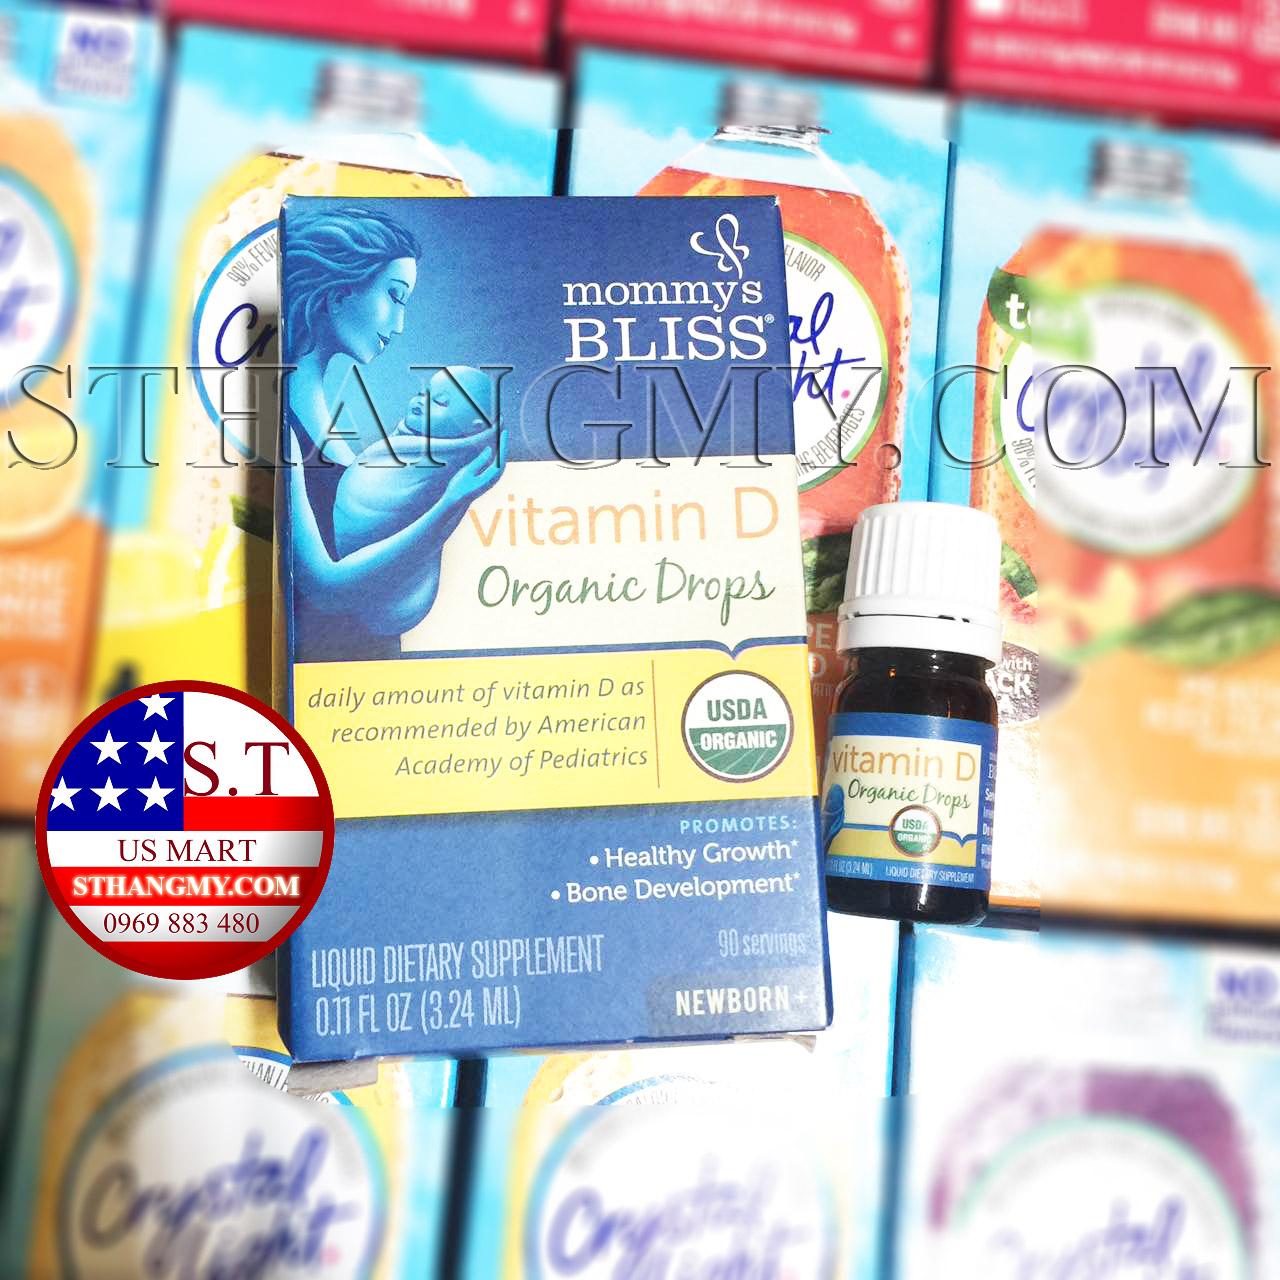 Vitamin D cho bé - Mommy Bliss Vitamin D Organic Drops 3.24ml